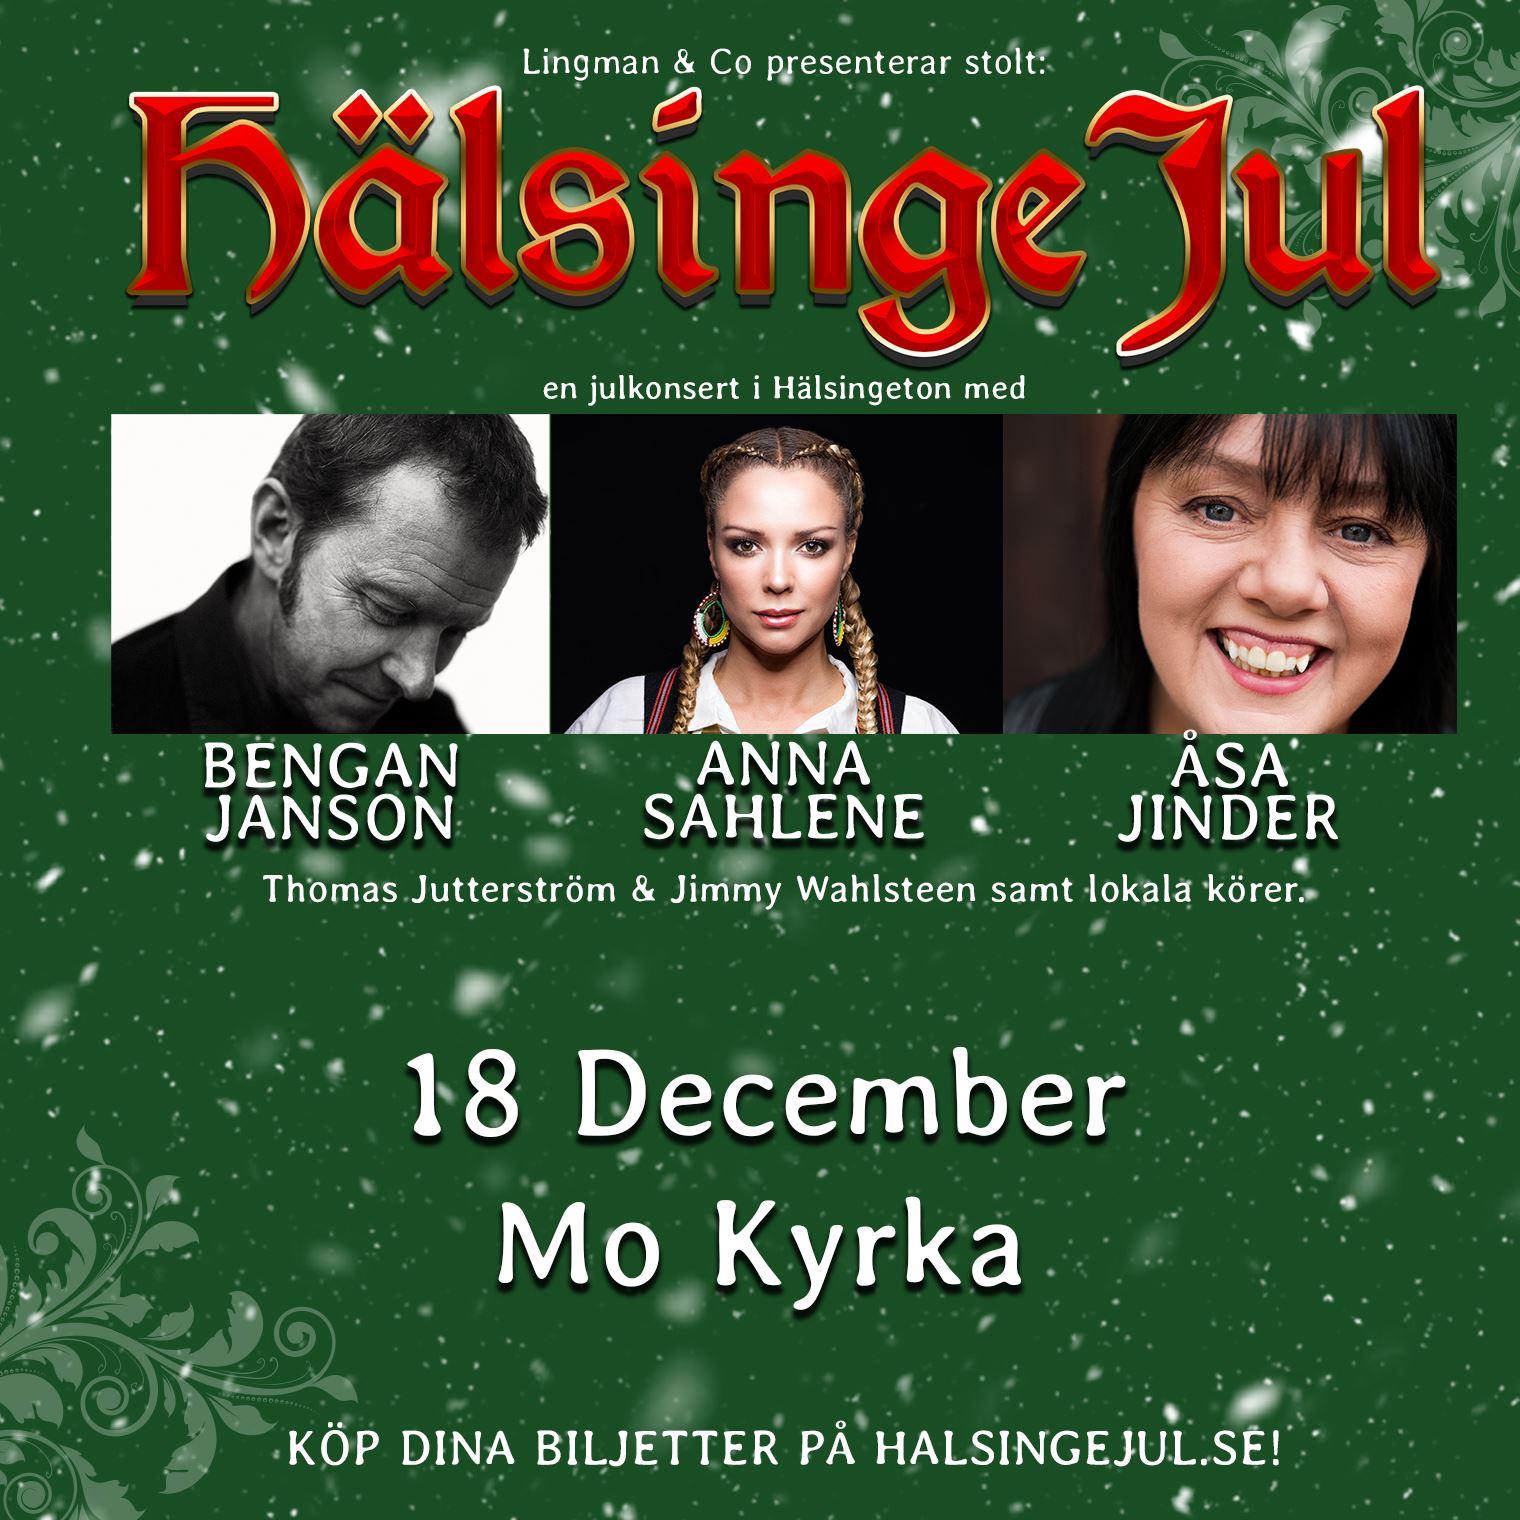 Hälsingejul, konsert med Bengan Jansson, Anna Sahlene och Åsa Jinder